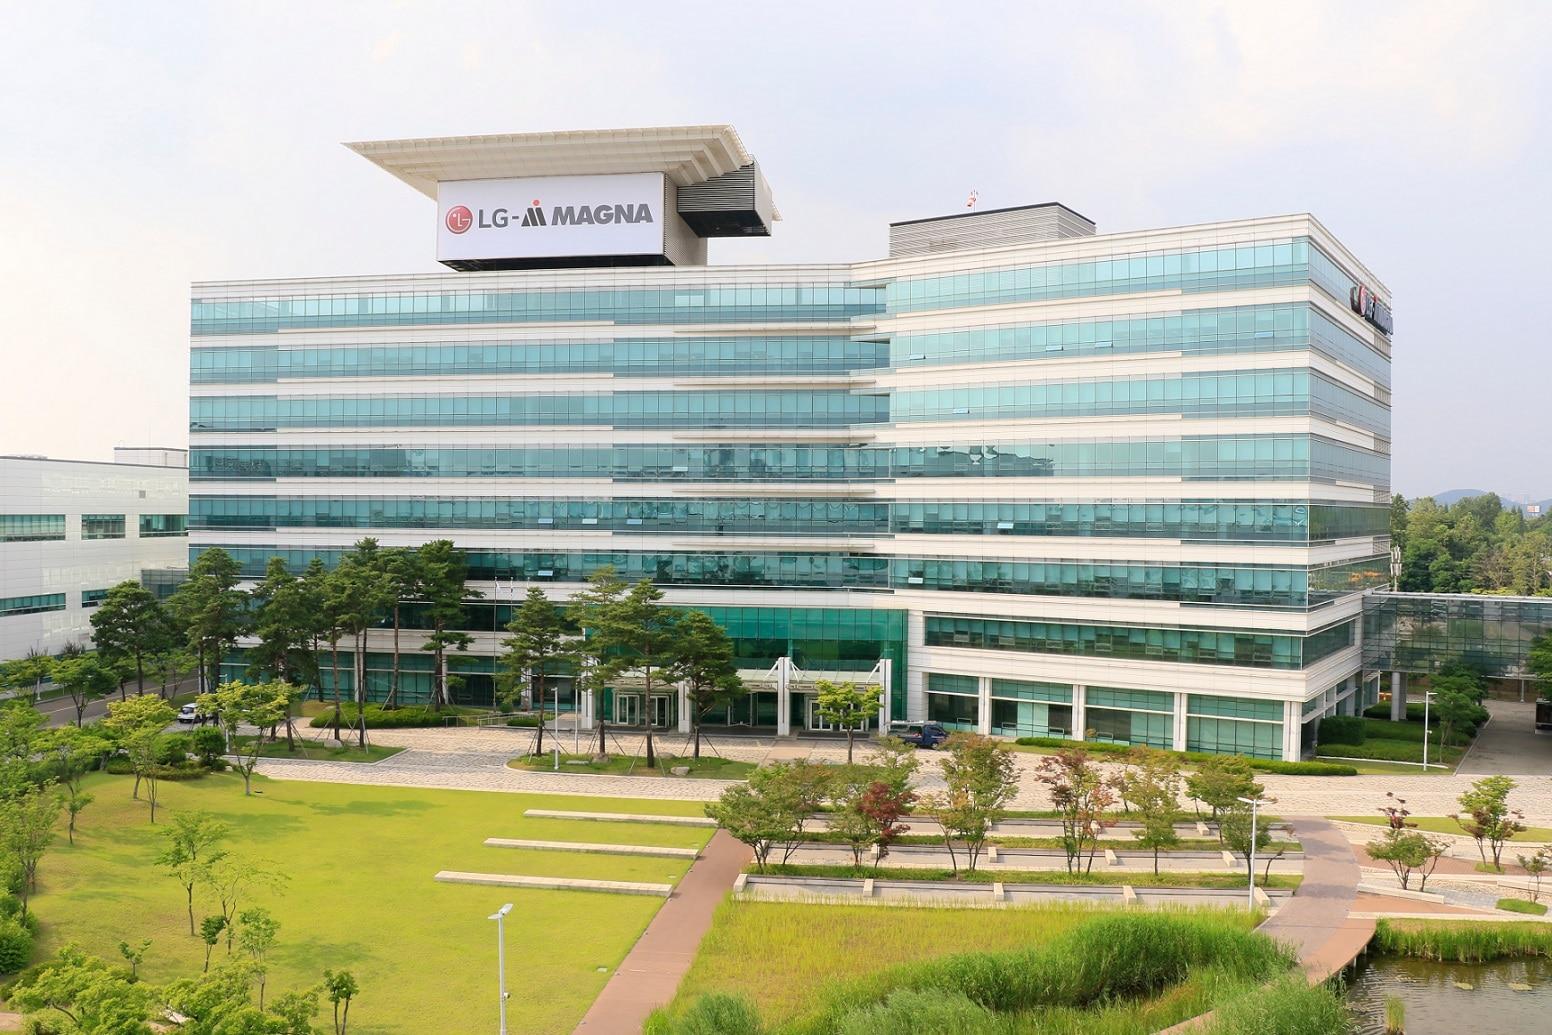 LG e Magna: nasce una joint venture tra le due aziende thumbnail